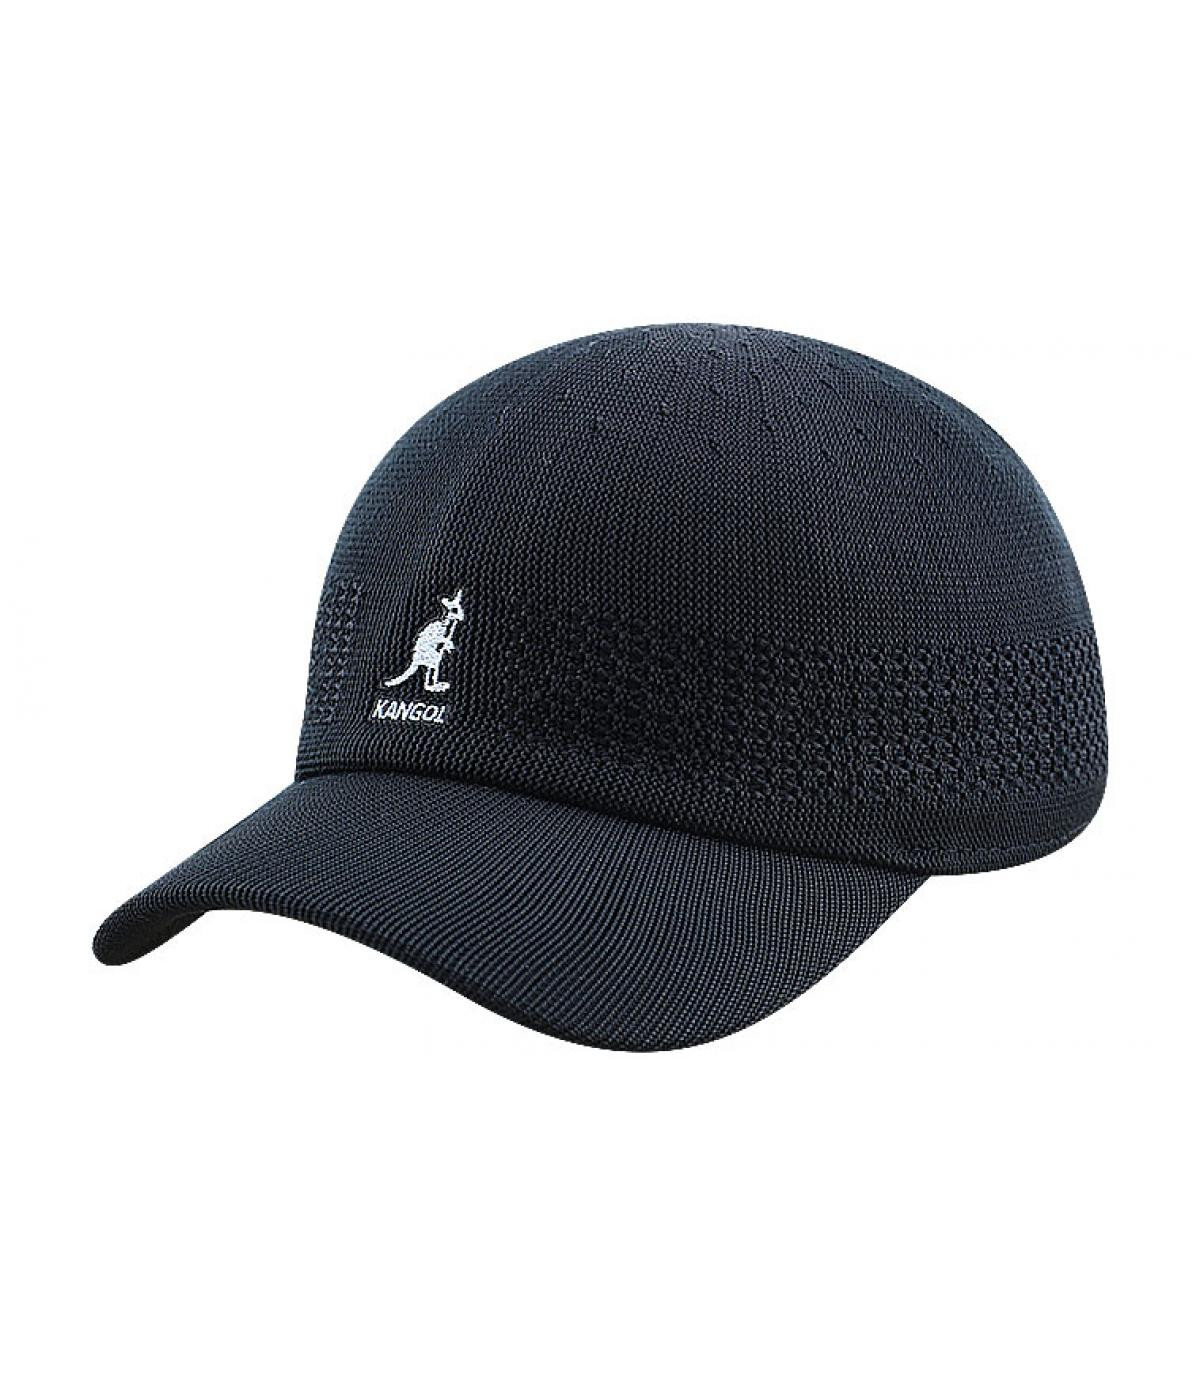 Cappellino trucker kangol nero